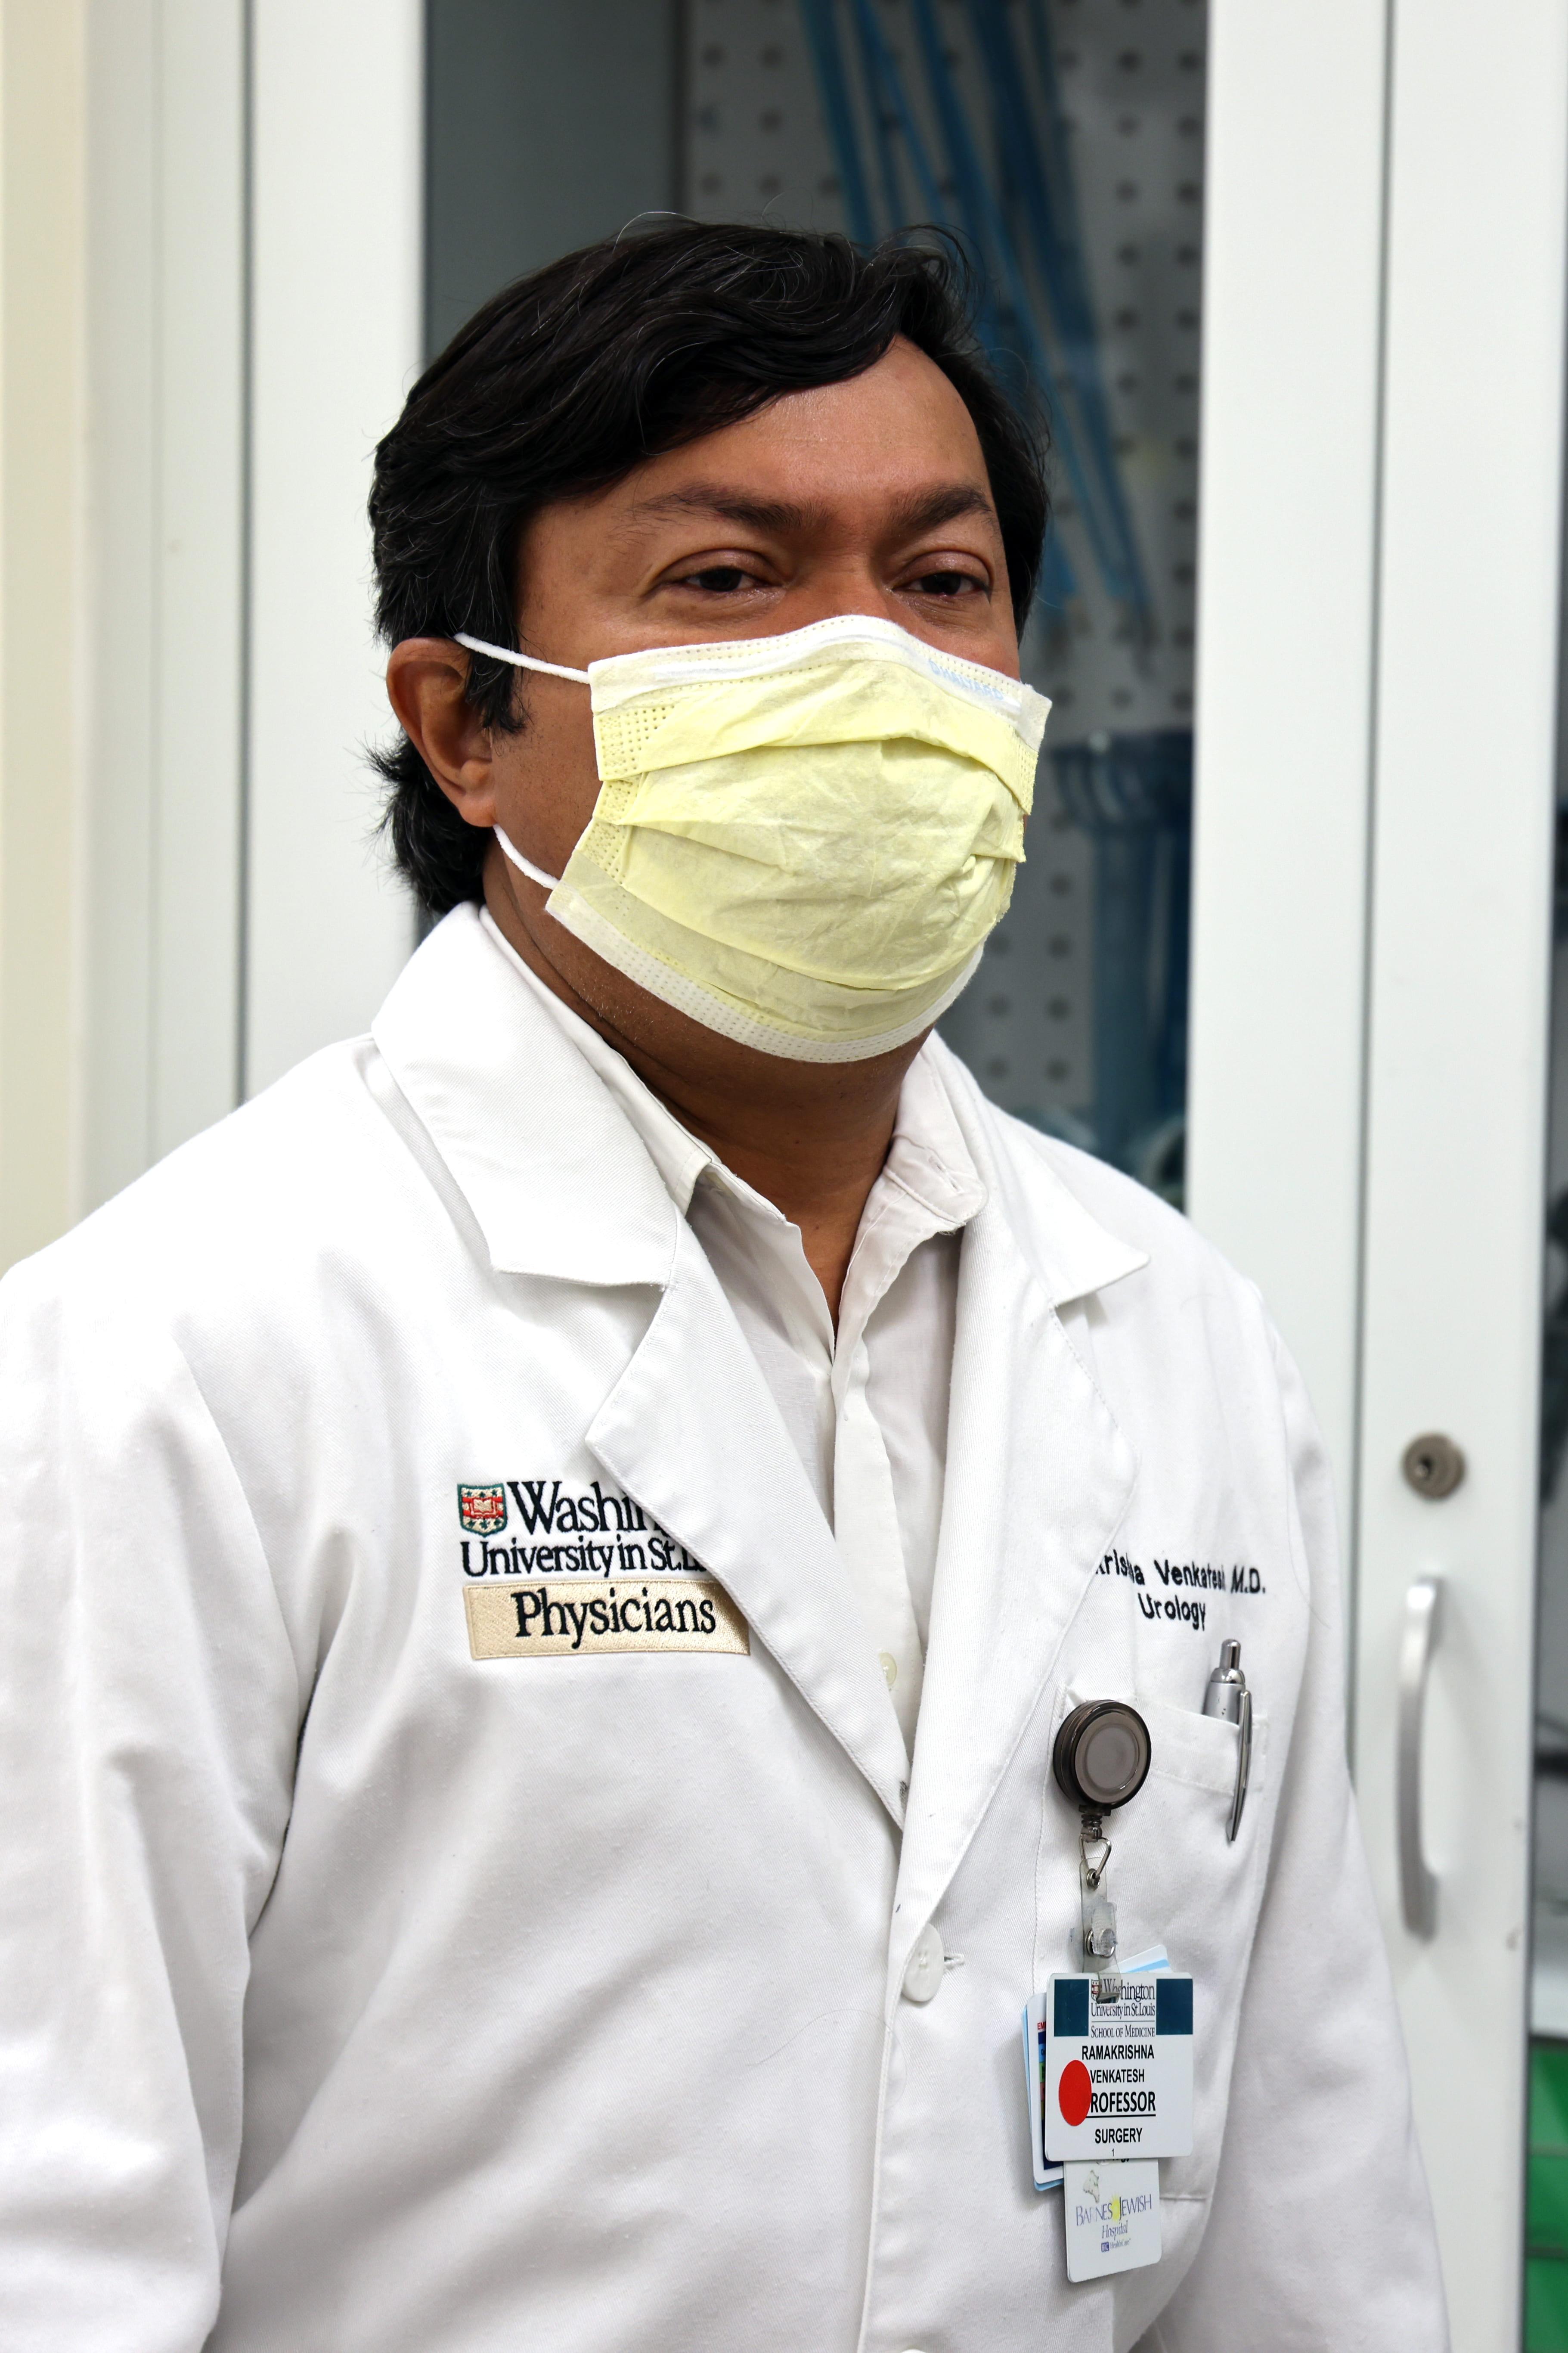 Ramakrishna Venkatesh, MD, Professor of Urologic Surgery